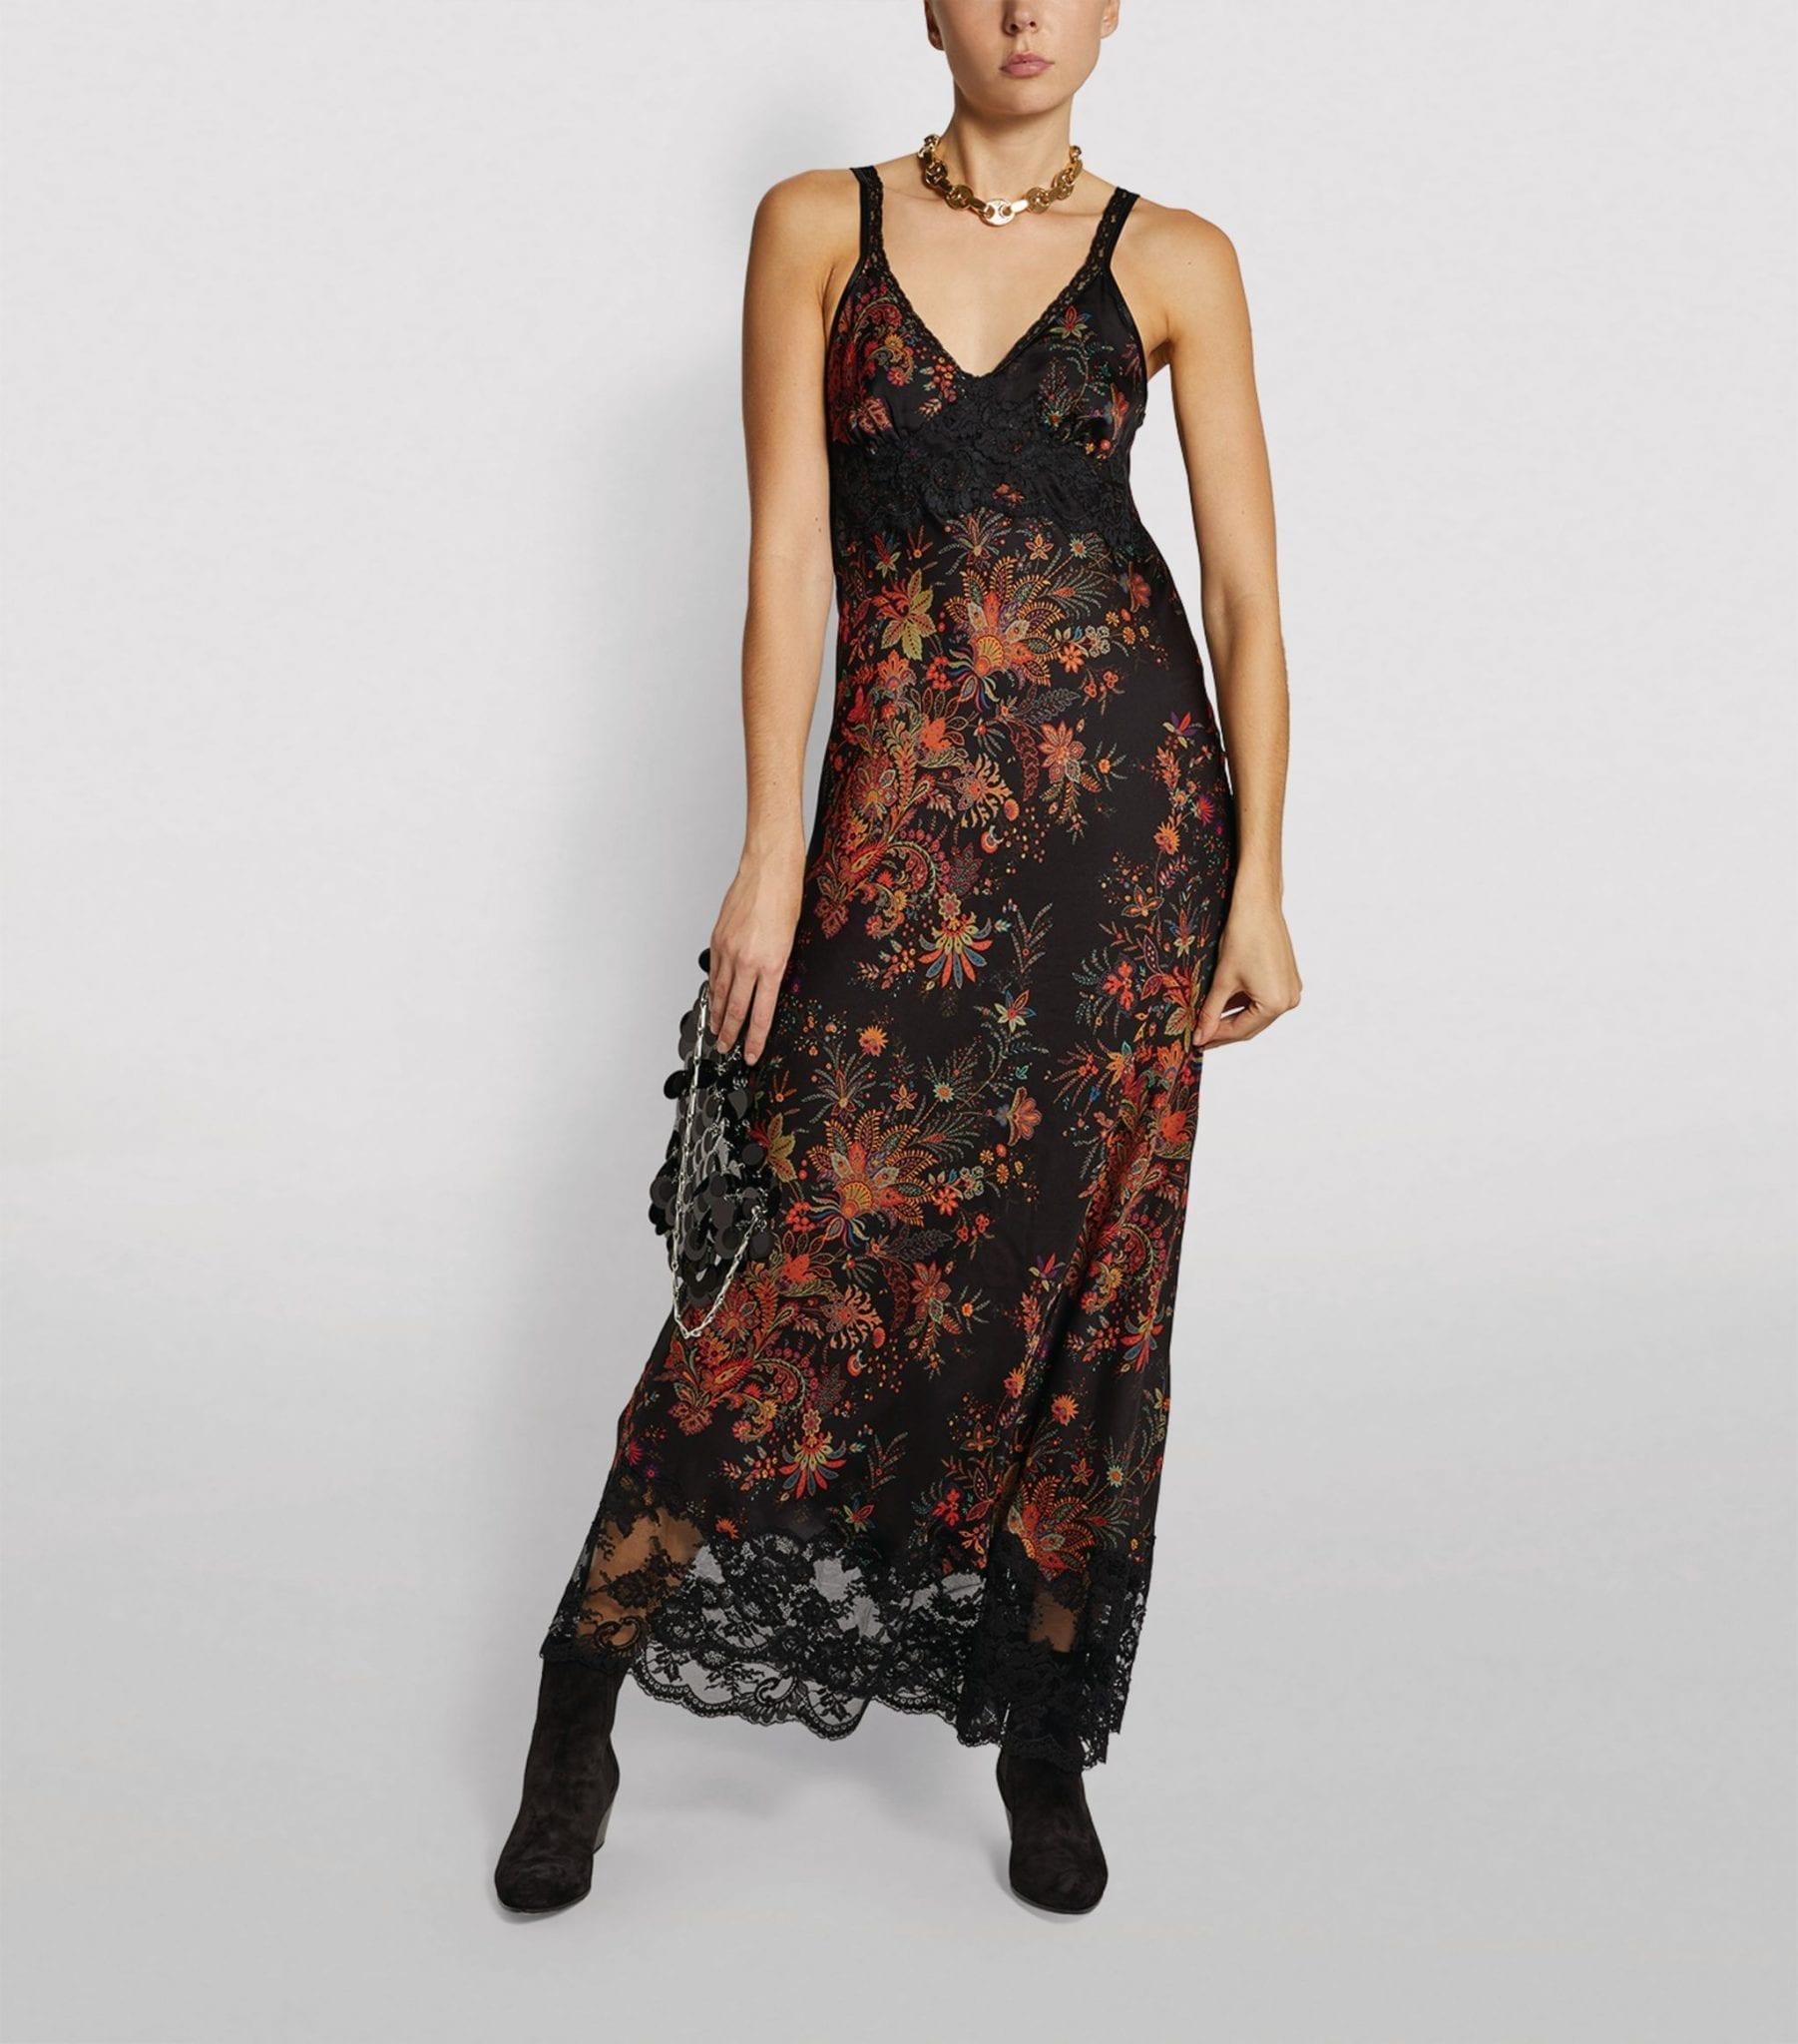 PACO RABANNE Floral Satin Slip Dress